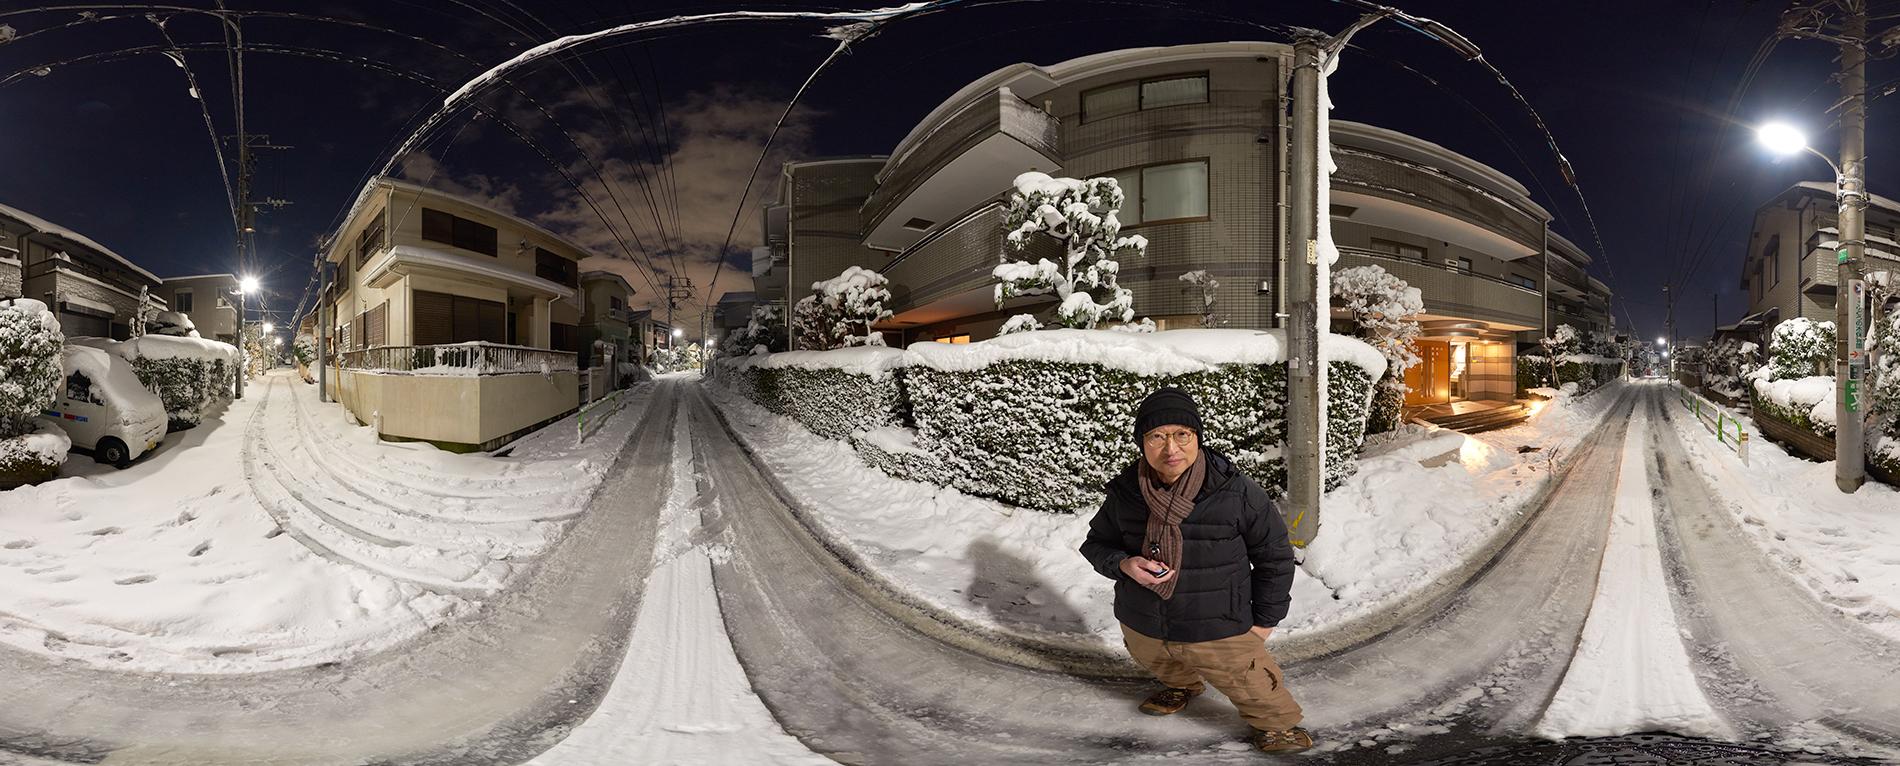 Selfie in heavy snowing